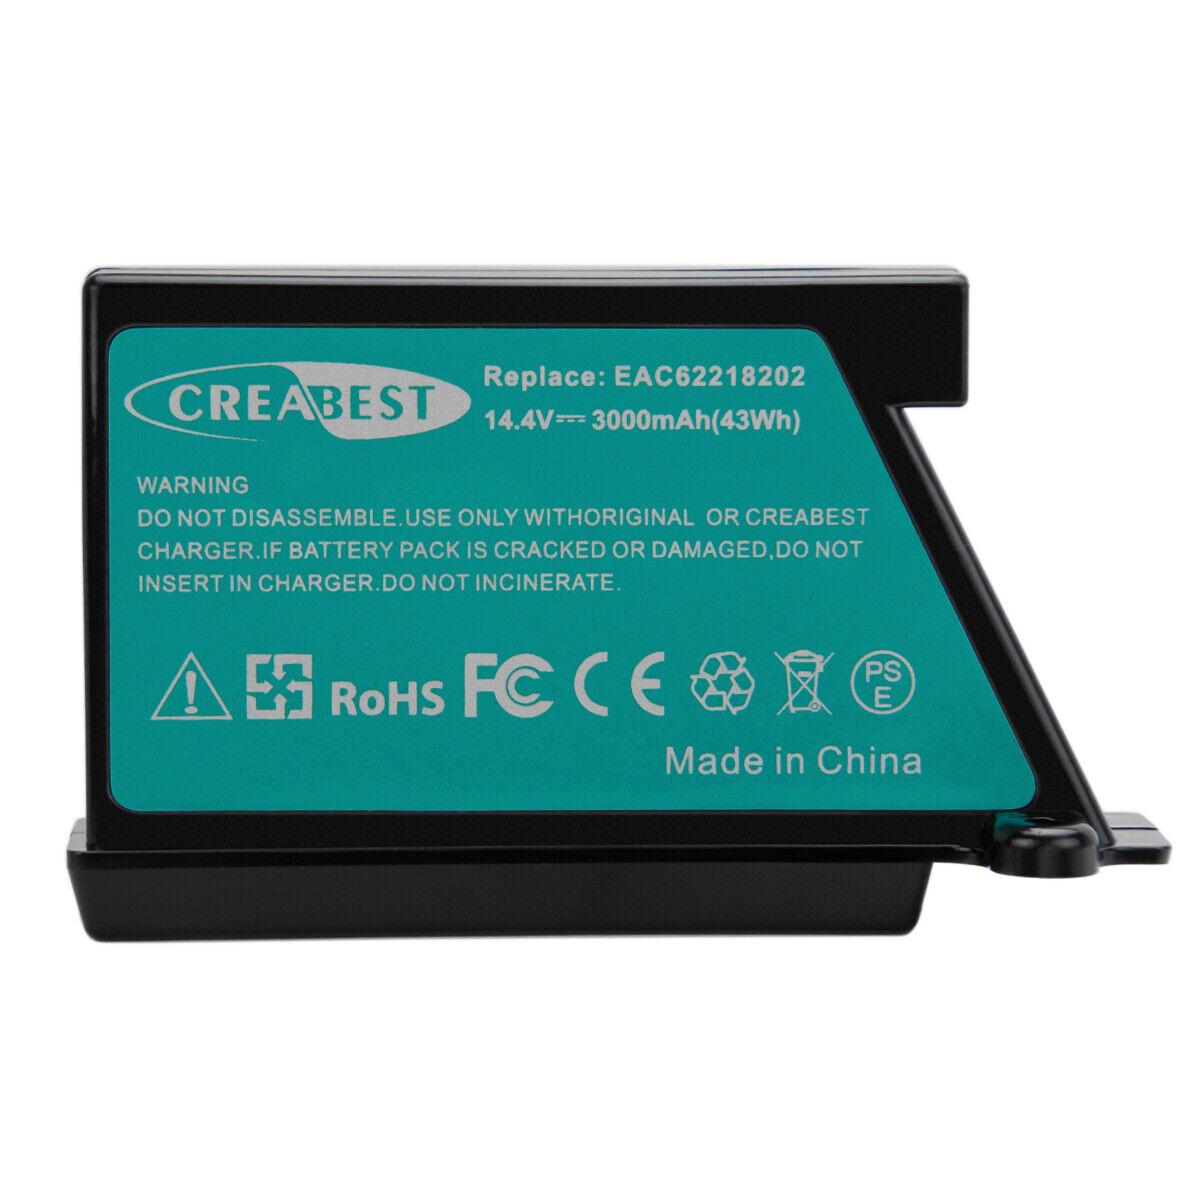 AKKU 14,4V 3000mAh Li-Ion für LG Hom-Bot VR62601LV VR62601LVM VR6260LV